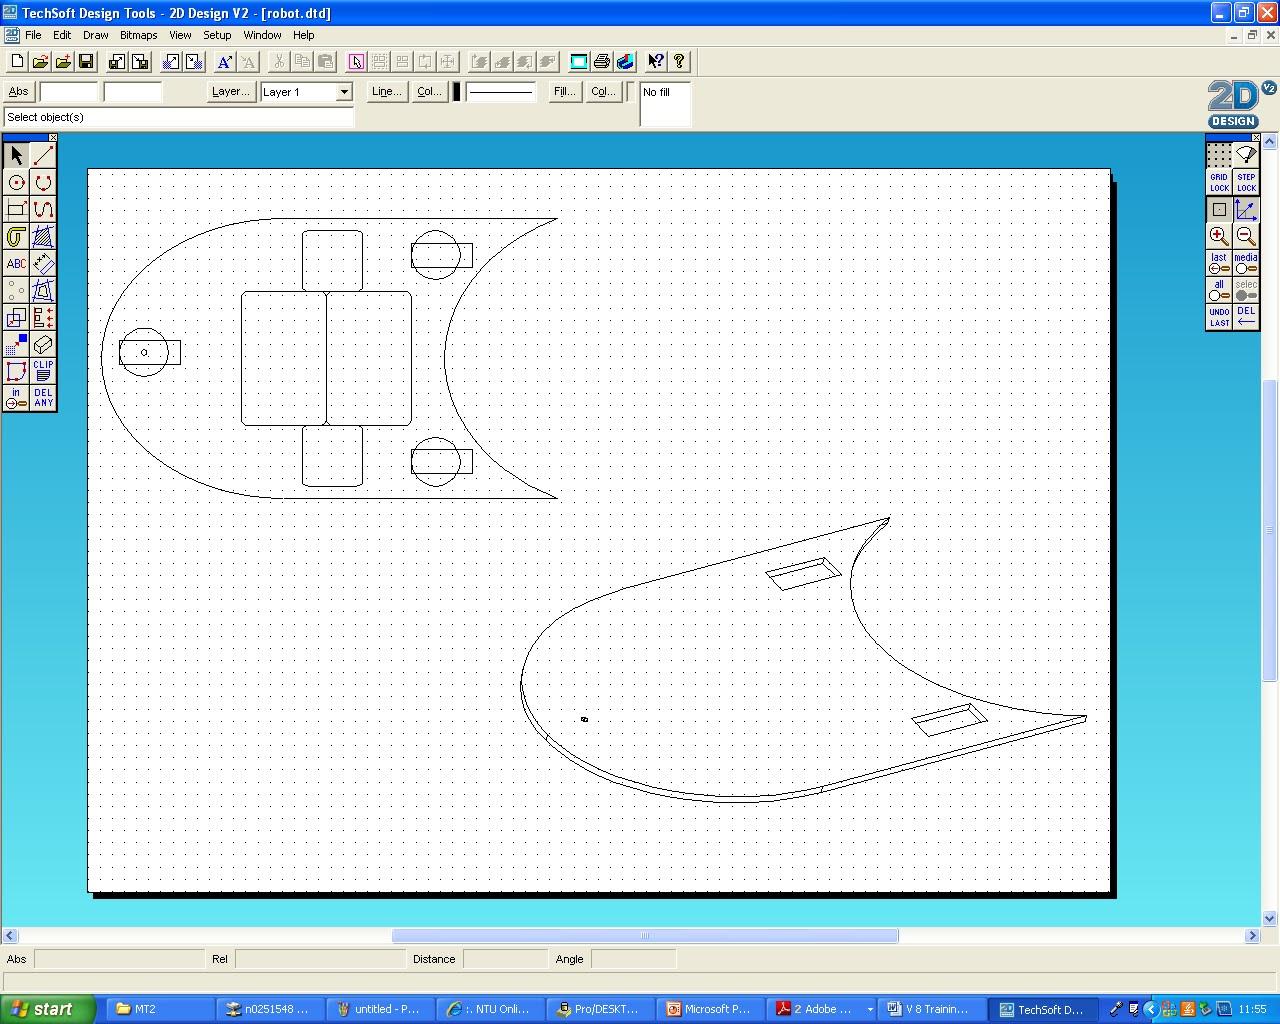 Nilesh - Product Design 2 ~ Module Task 2 - CAD: 2D Design